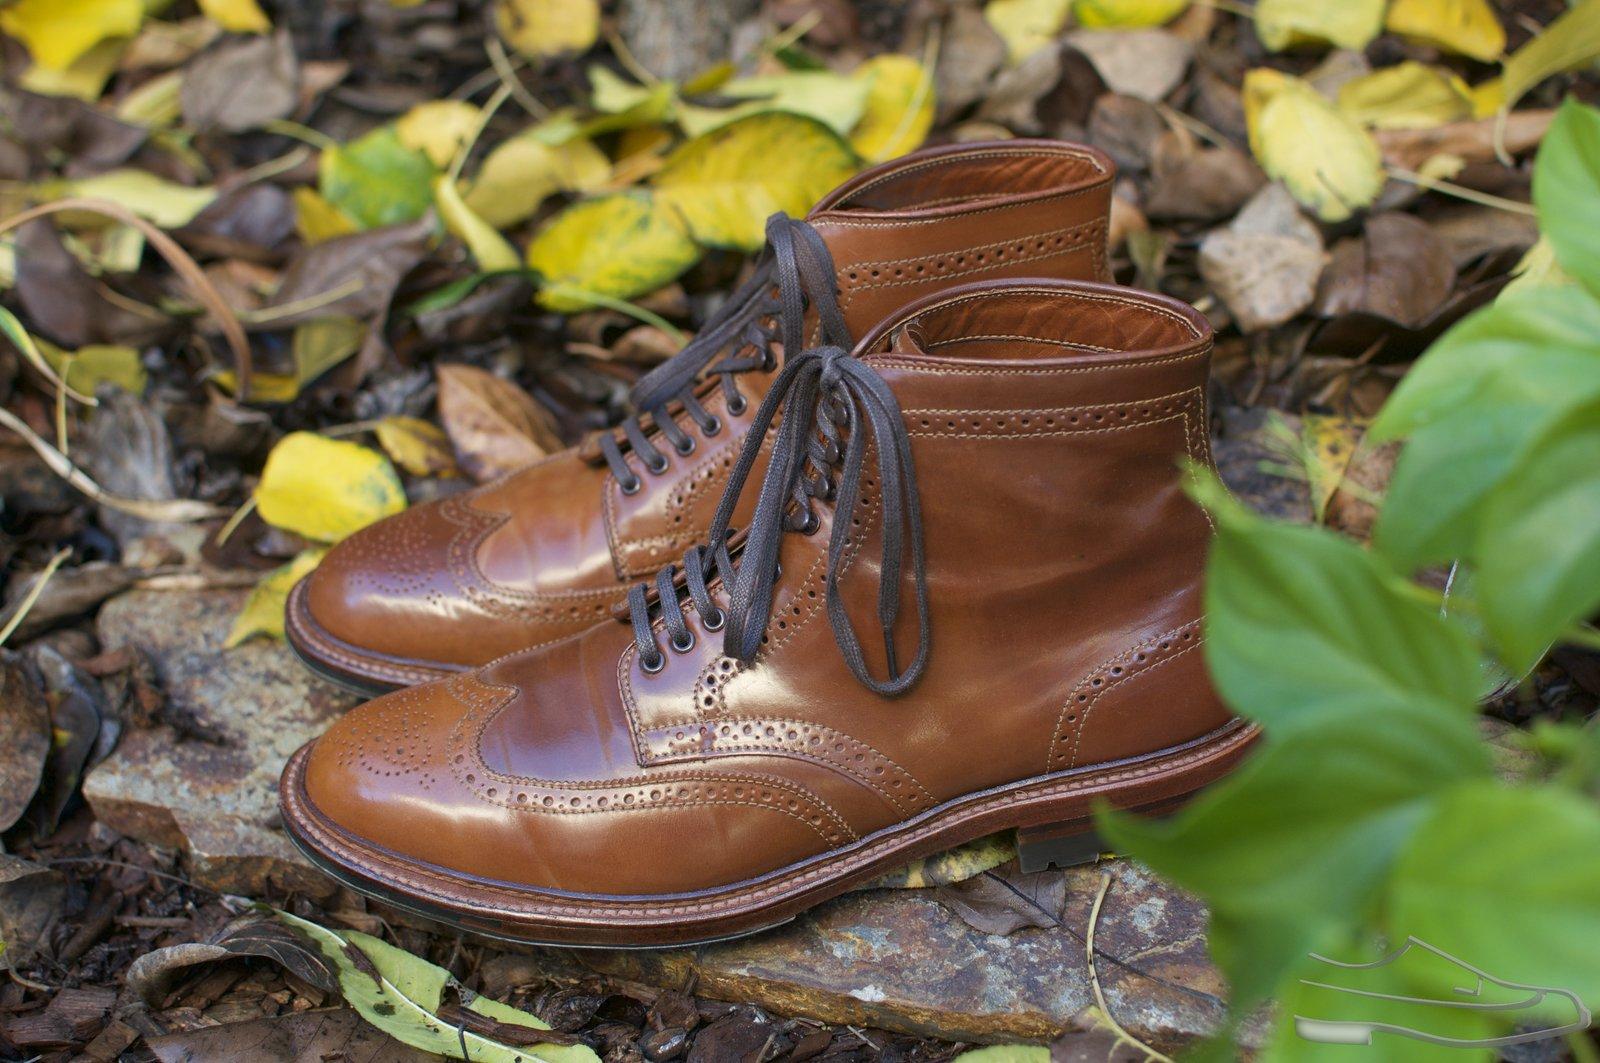 Alden Whiskey Shell Cordovan WT Boots - 2020-11-25 - 2.jpg